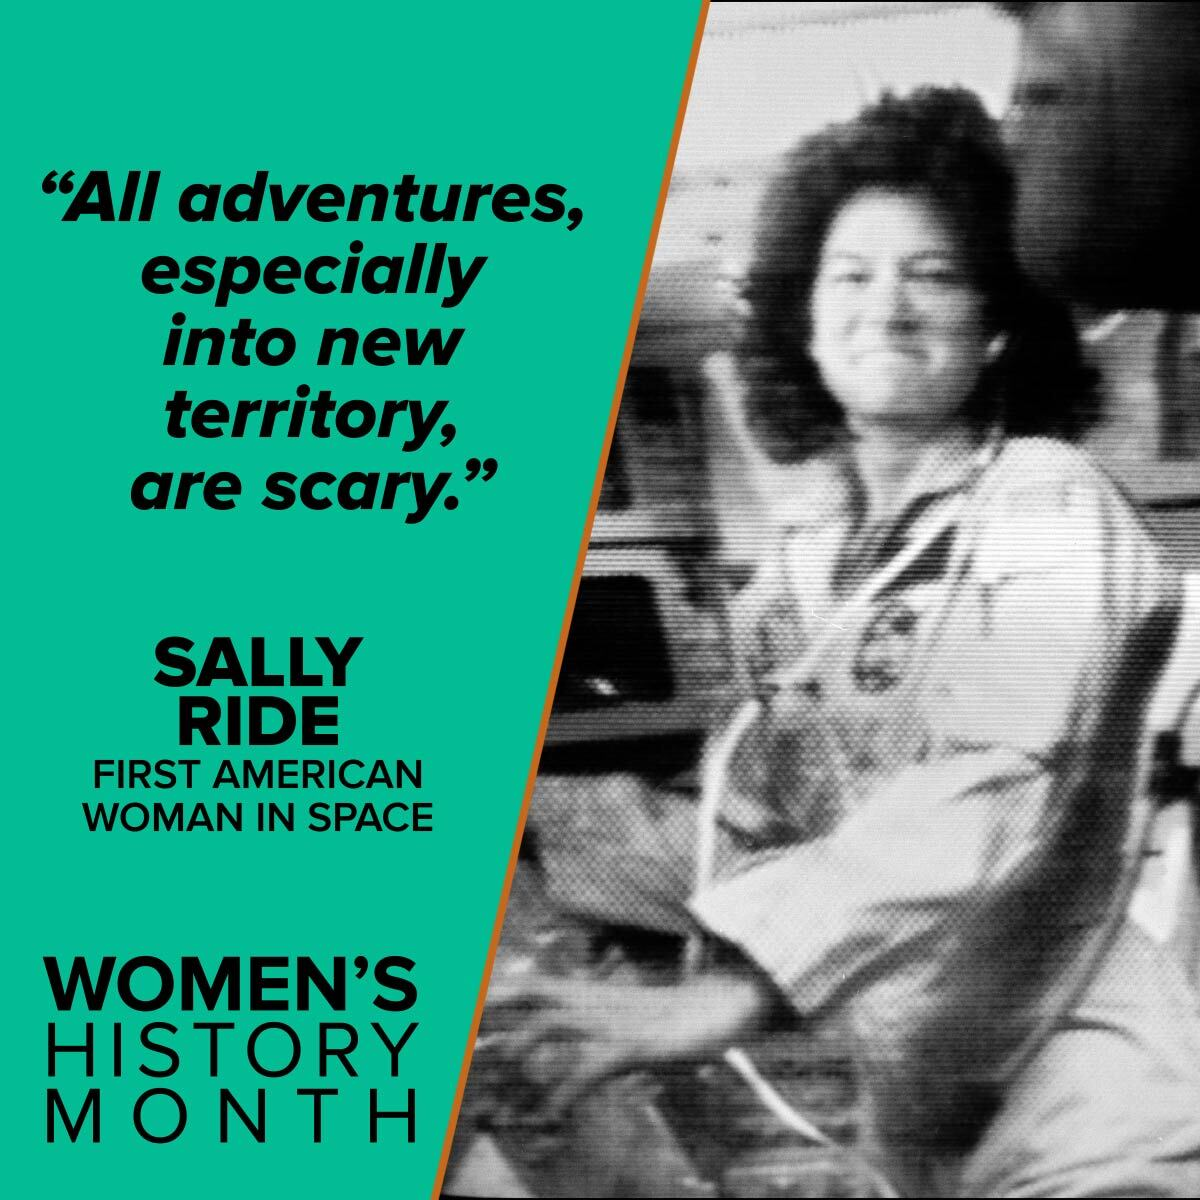 Women's History Month_Sally Ride.jpg